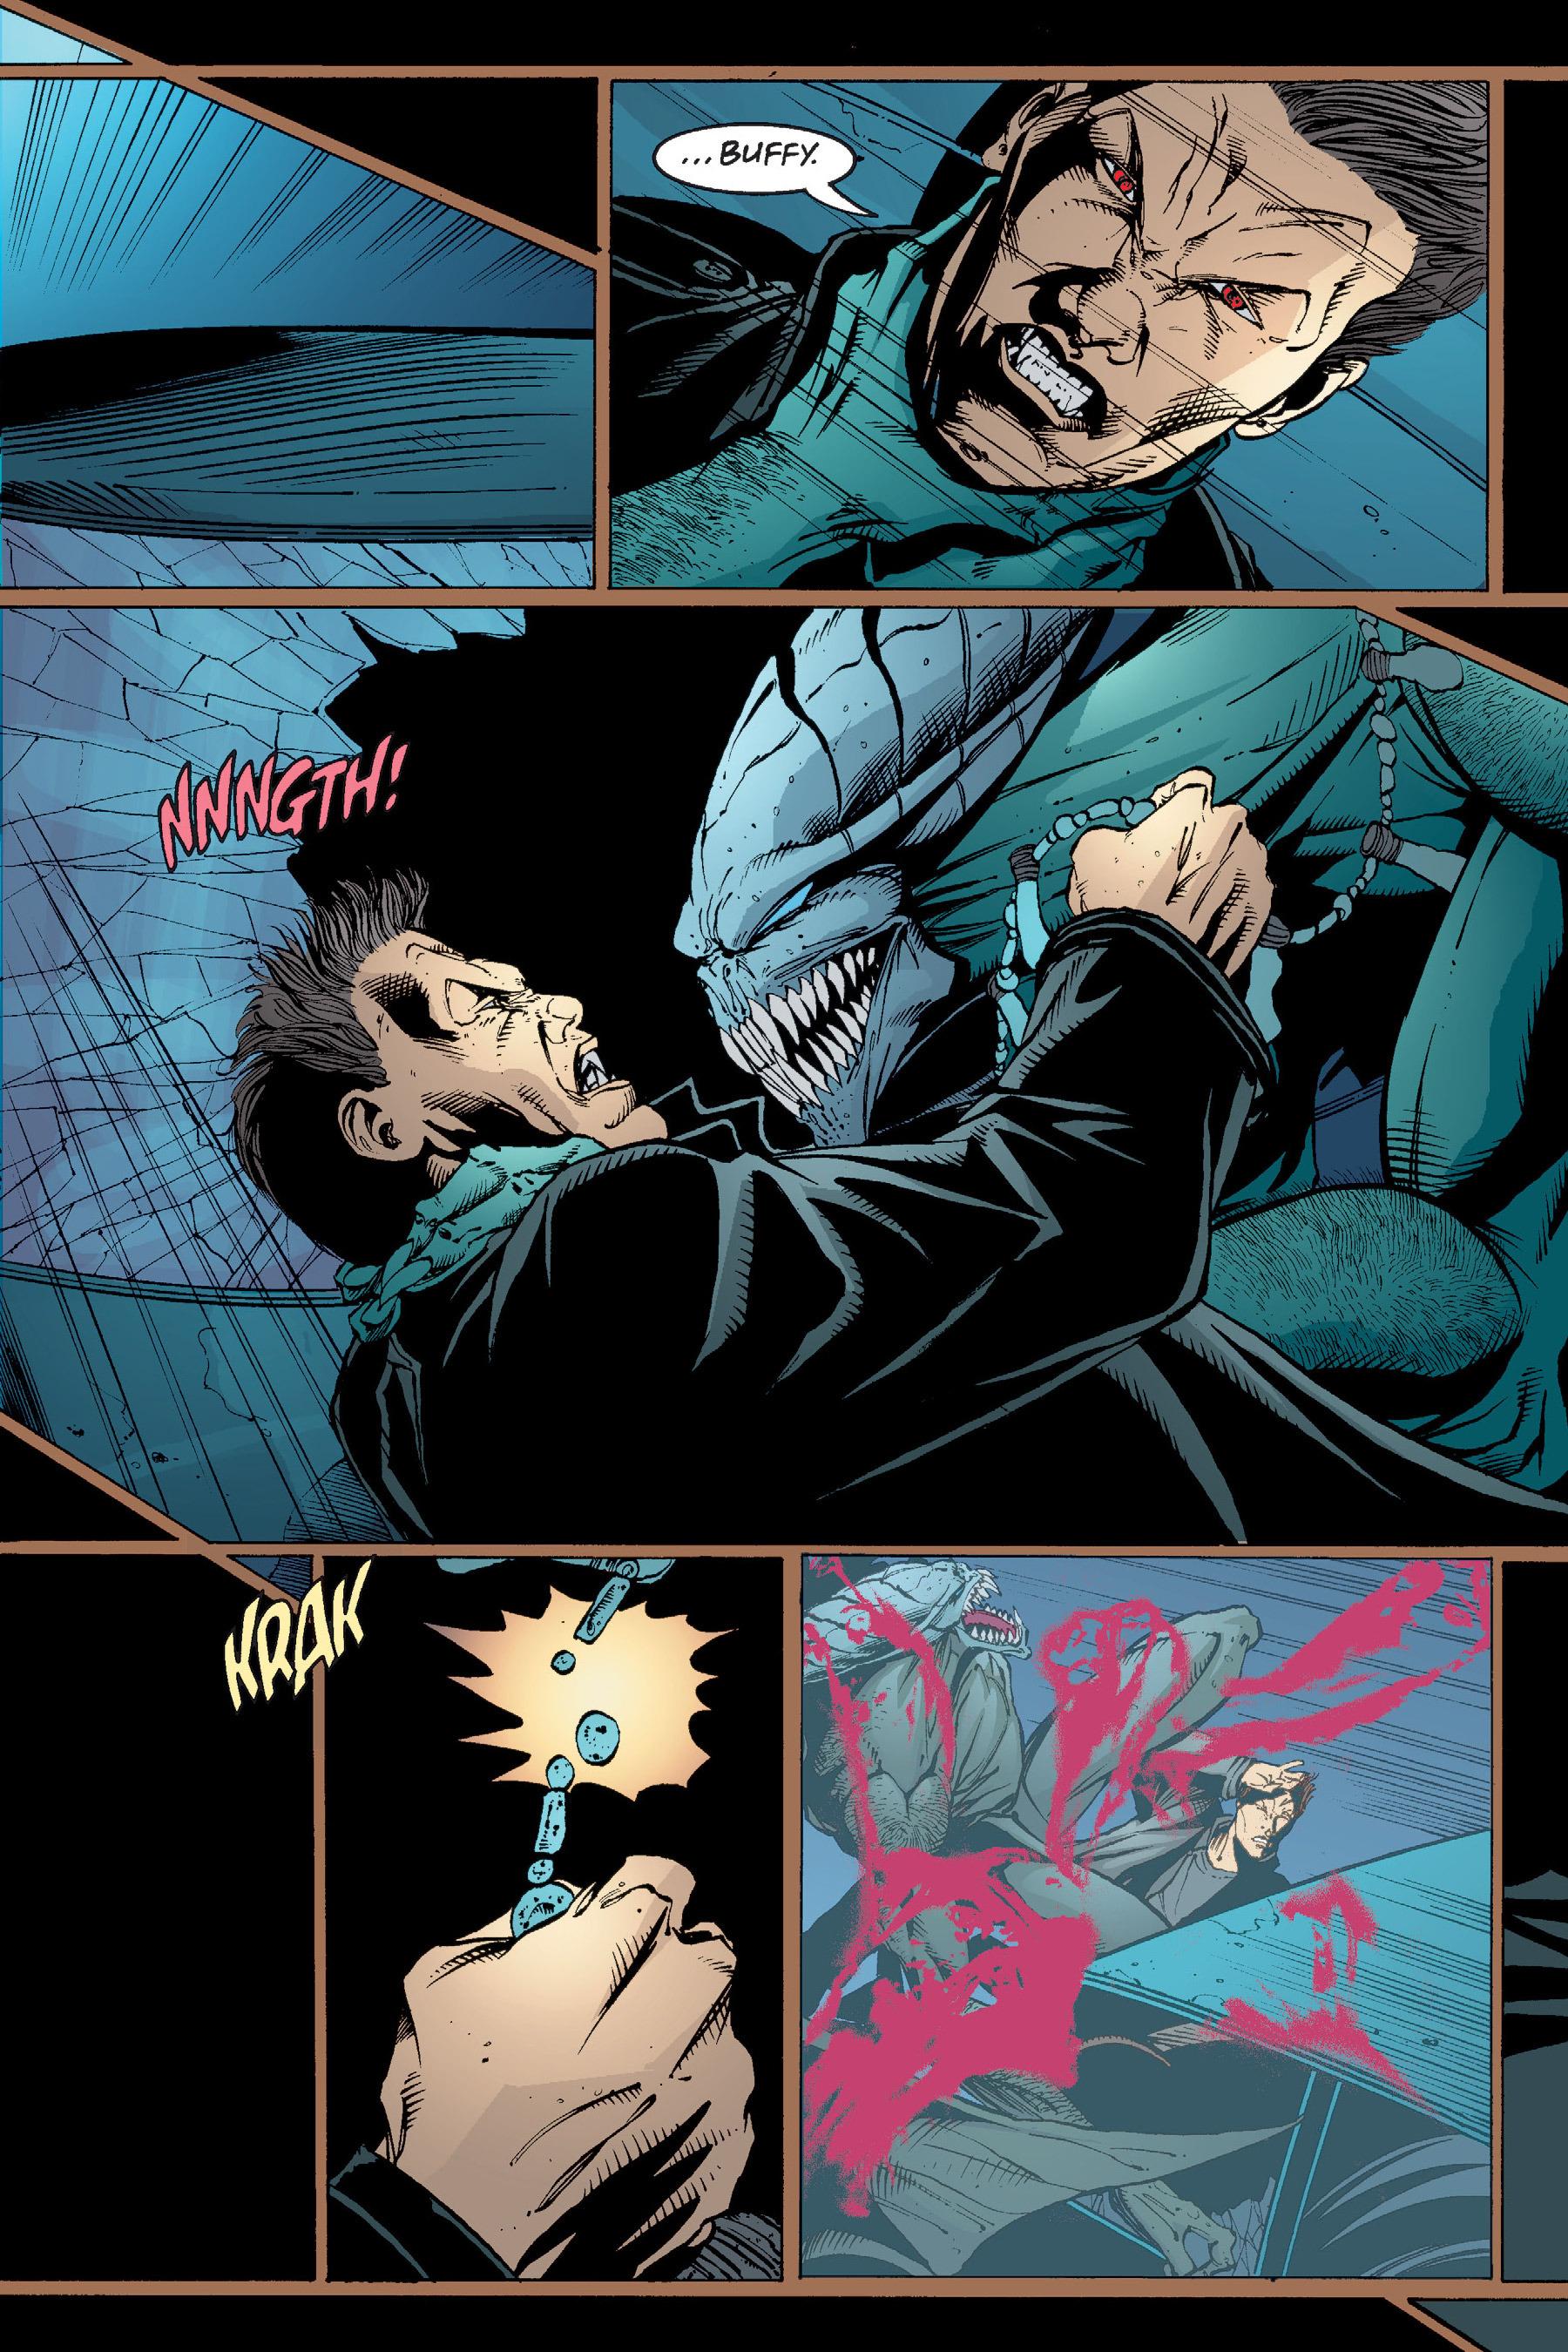 Read online Buffy the Vampire Slayer: Omnibus comic -  Issue # TPB 4 - 361